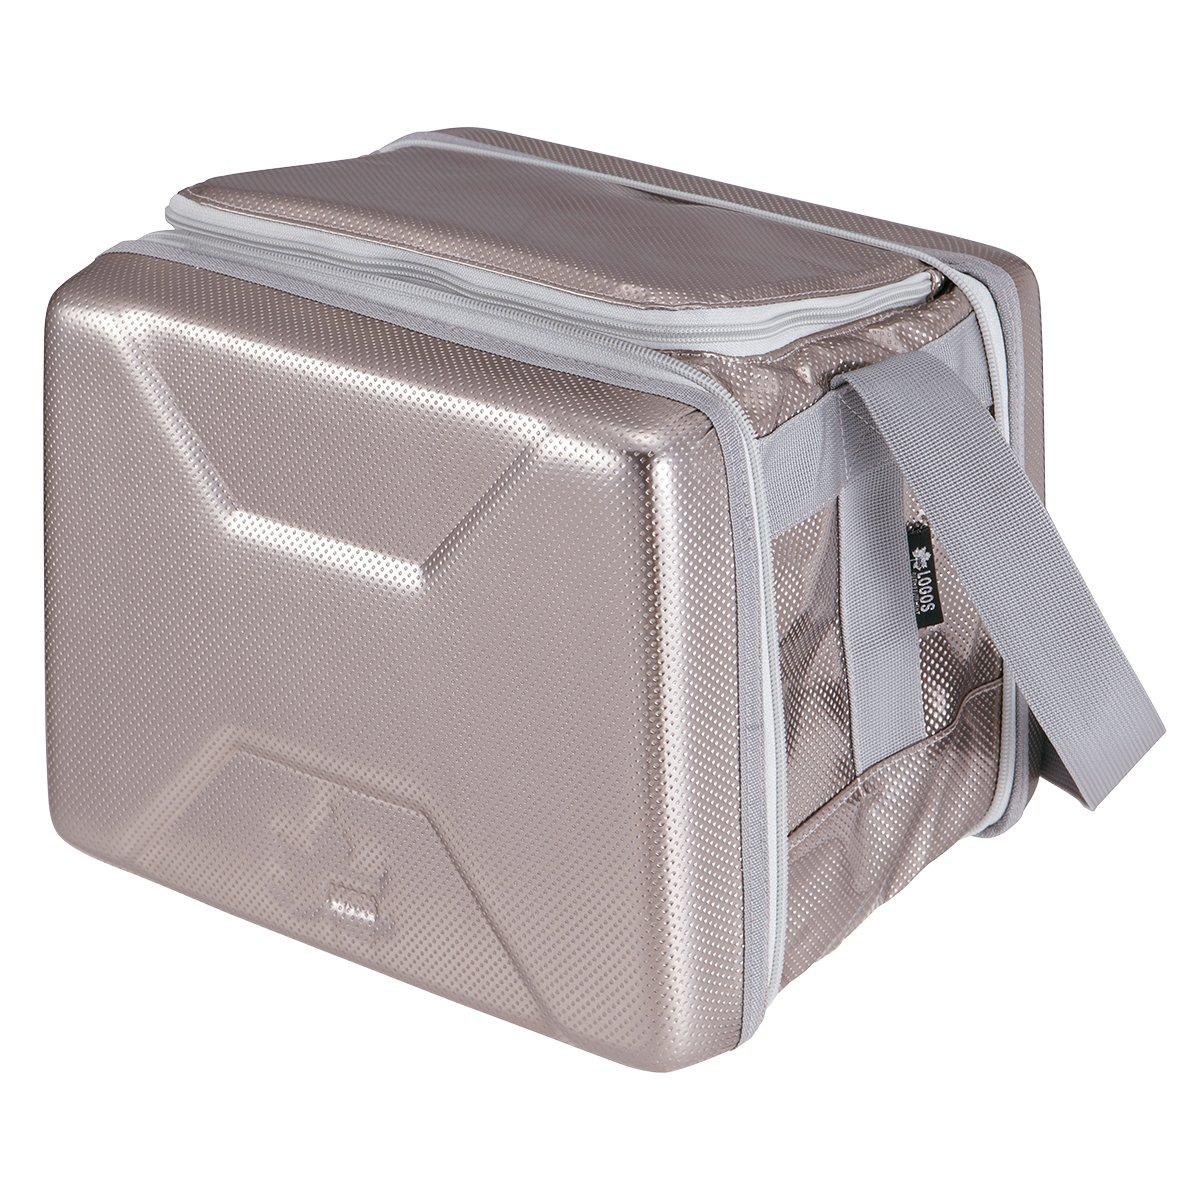 LOGOS Hyper Sub-Zero Cooler M 81670070 by